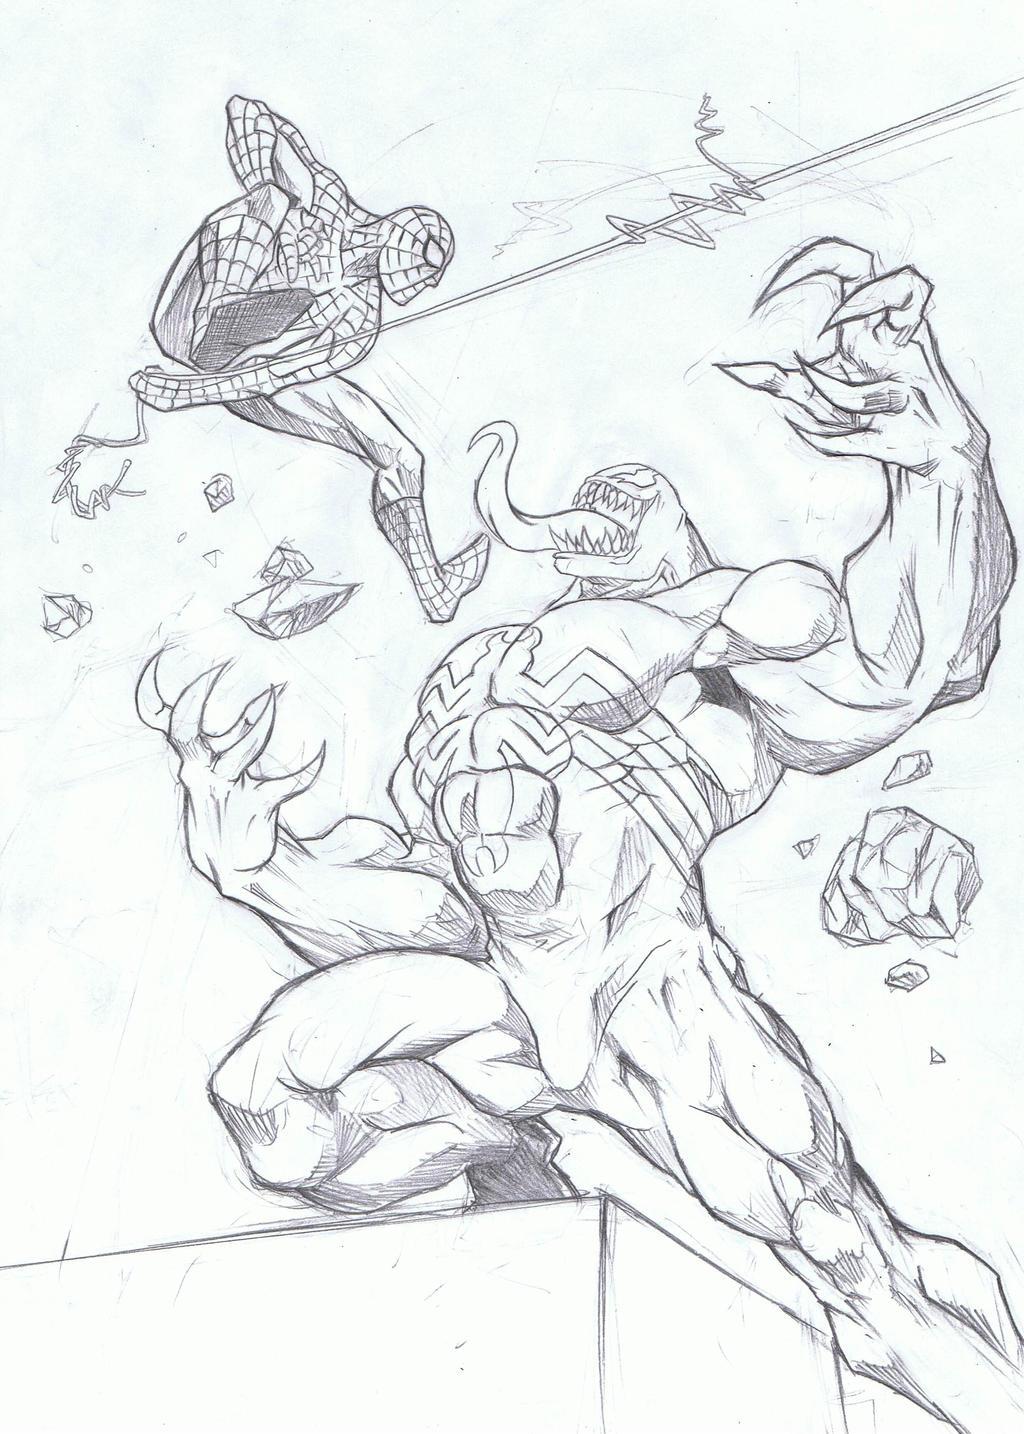 Spidey vs venom by karuma9 on deviantart for Spiderman vs venom coloring pages